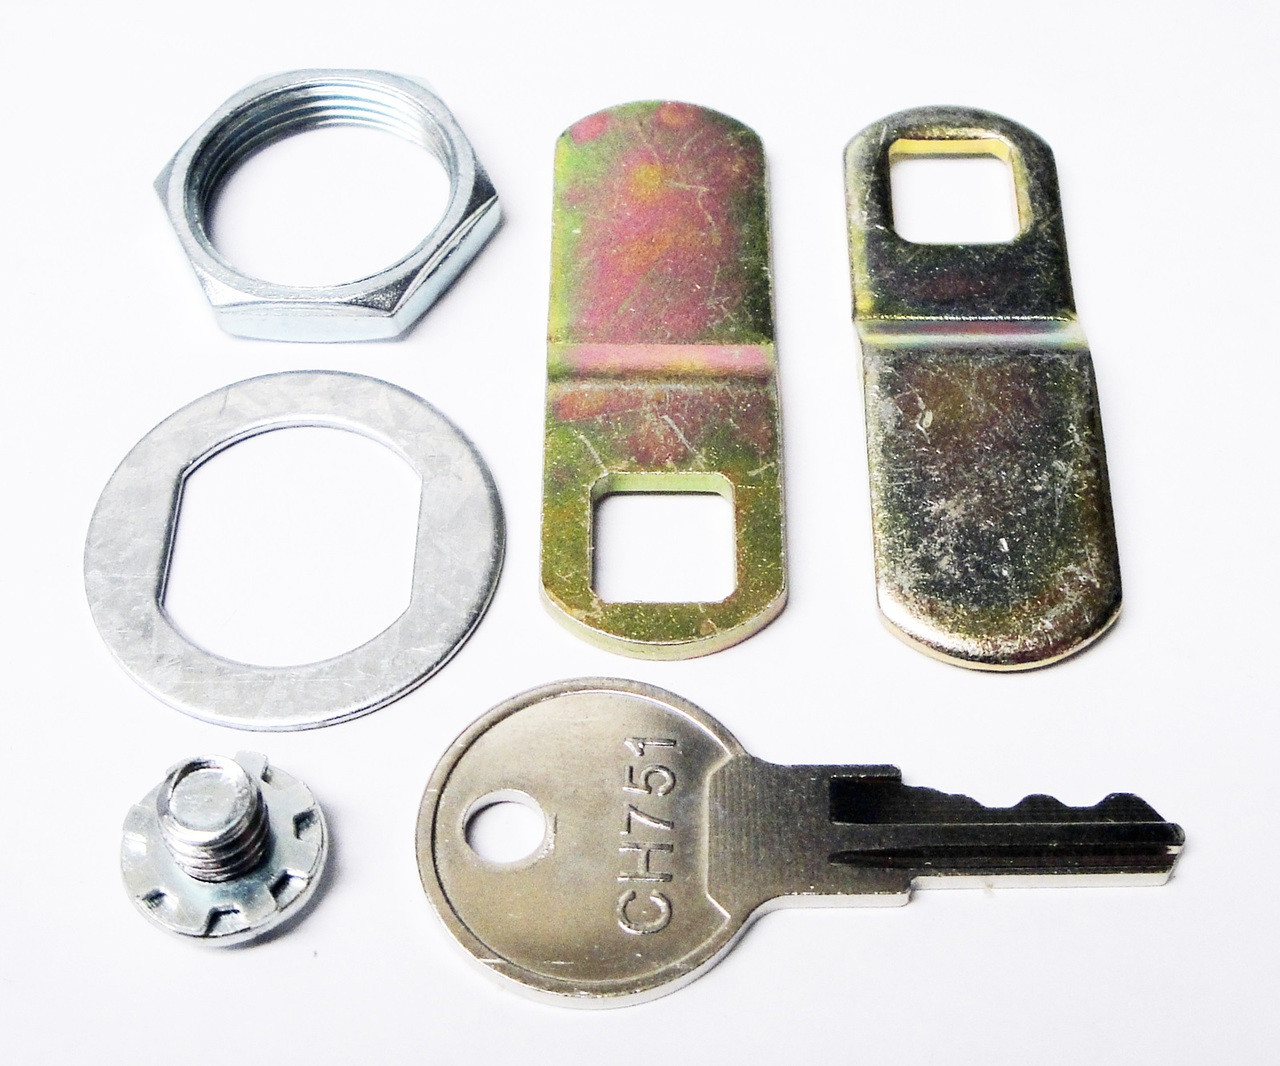 armstrong customized thumbturn cam lock [ 1280 x 1066 Pixel ]